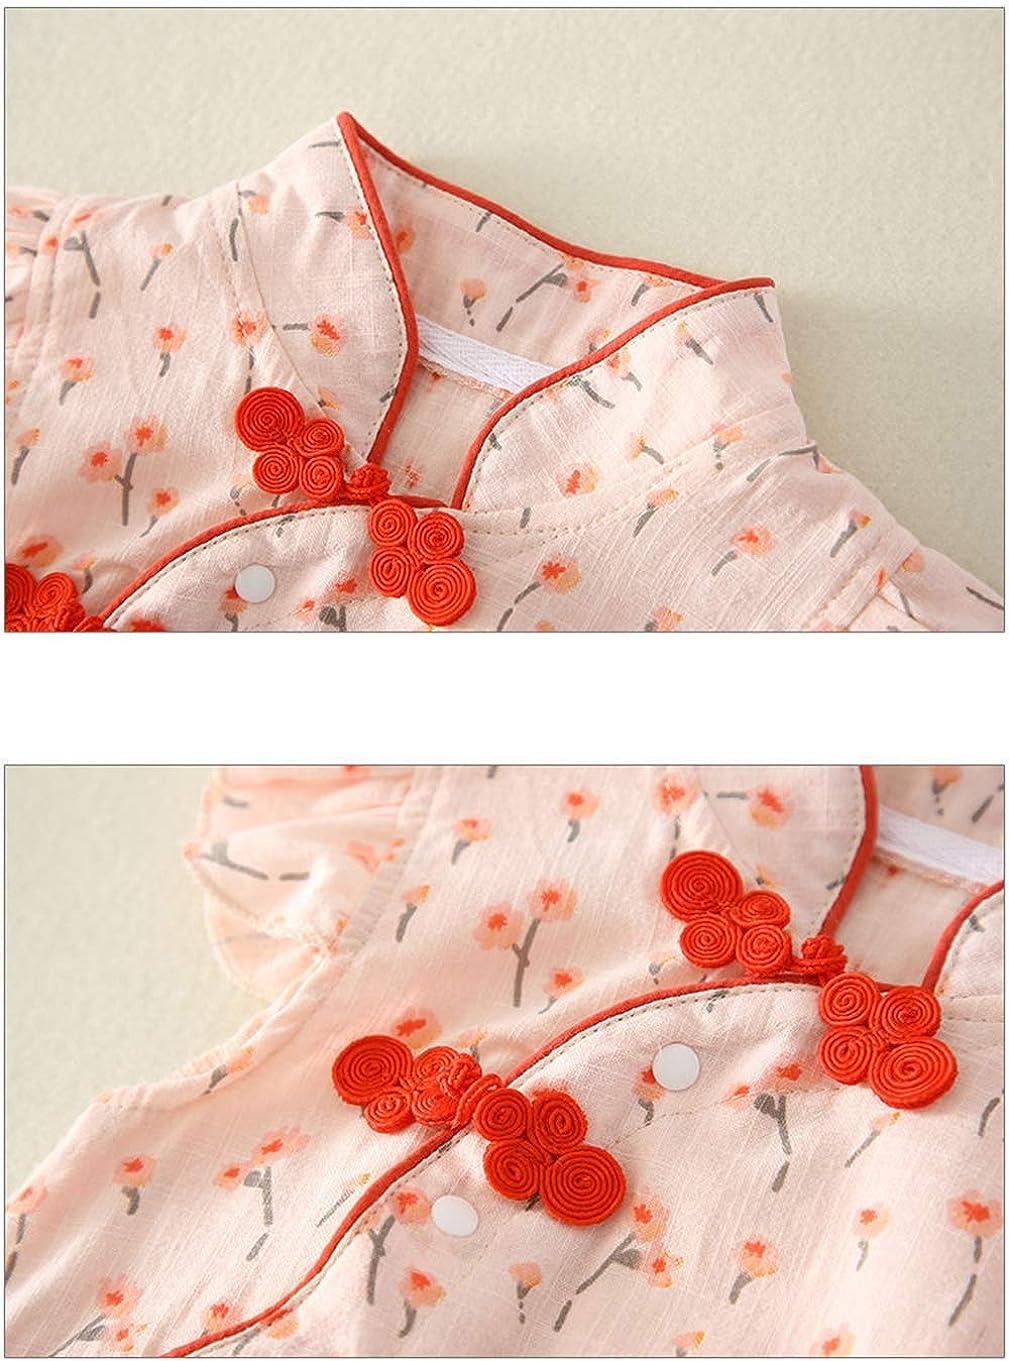 Newborn Girls Toddler Pajamas Cheongsam Baby Vest Print Short-Sleeve Outfits Summer